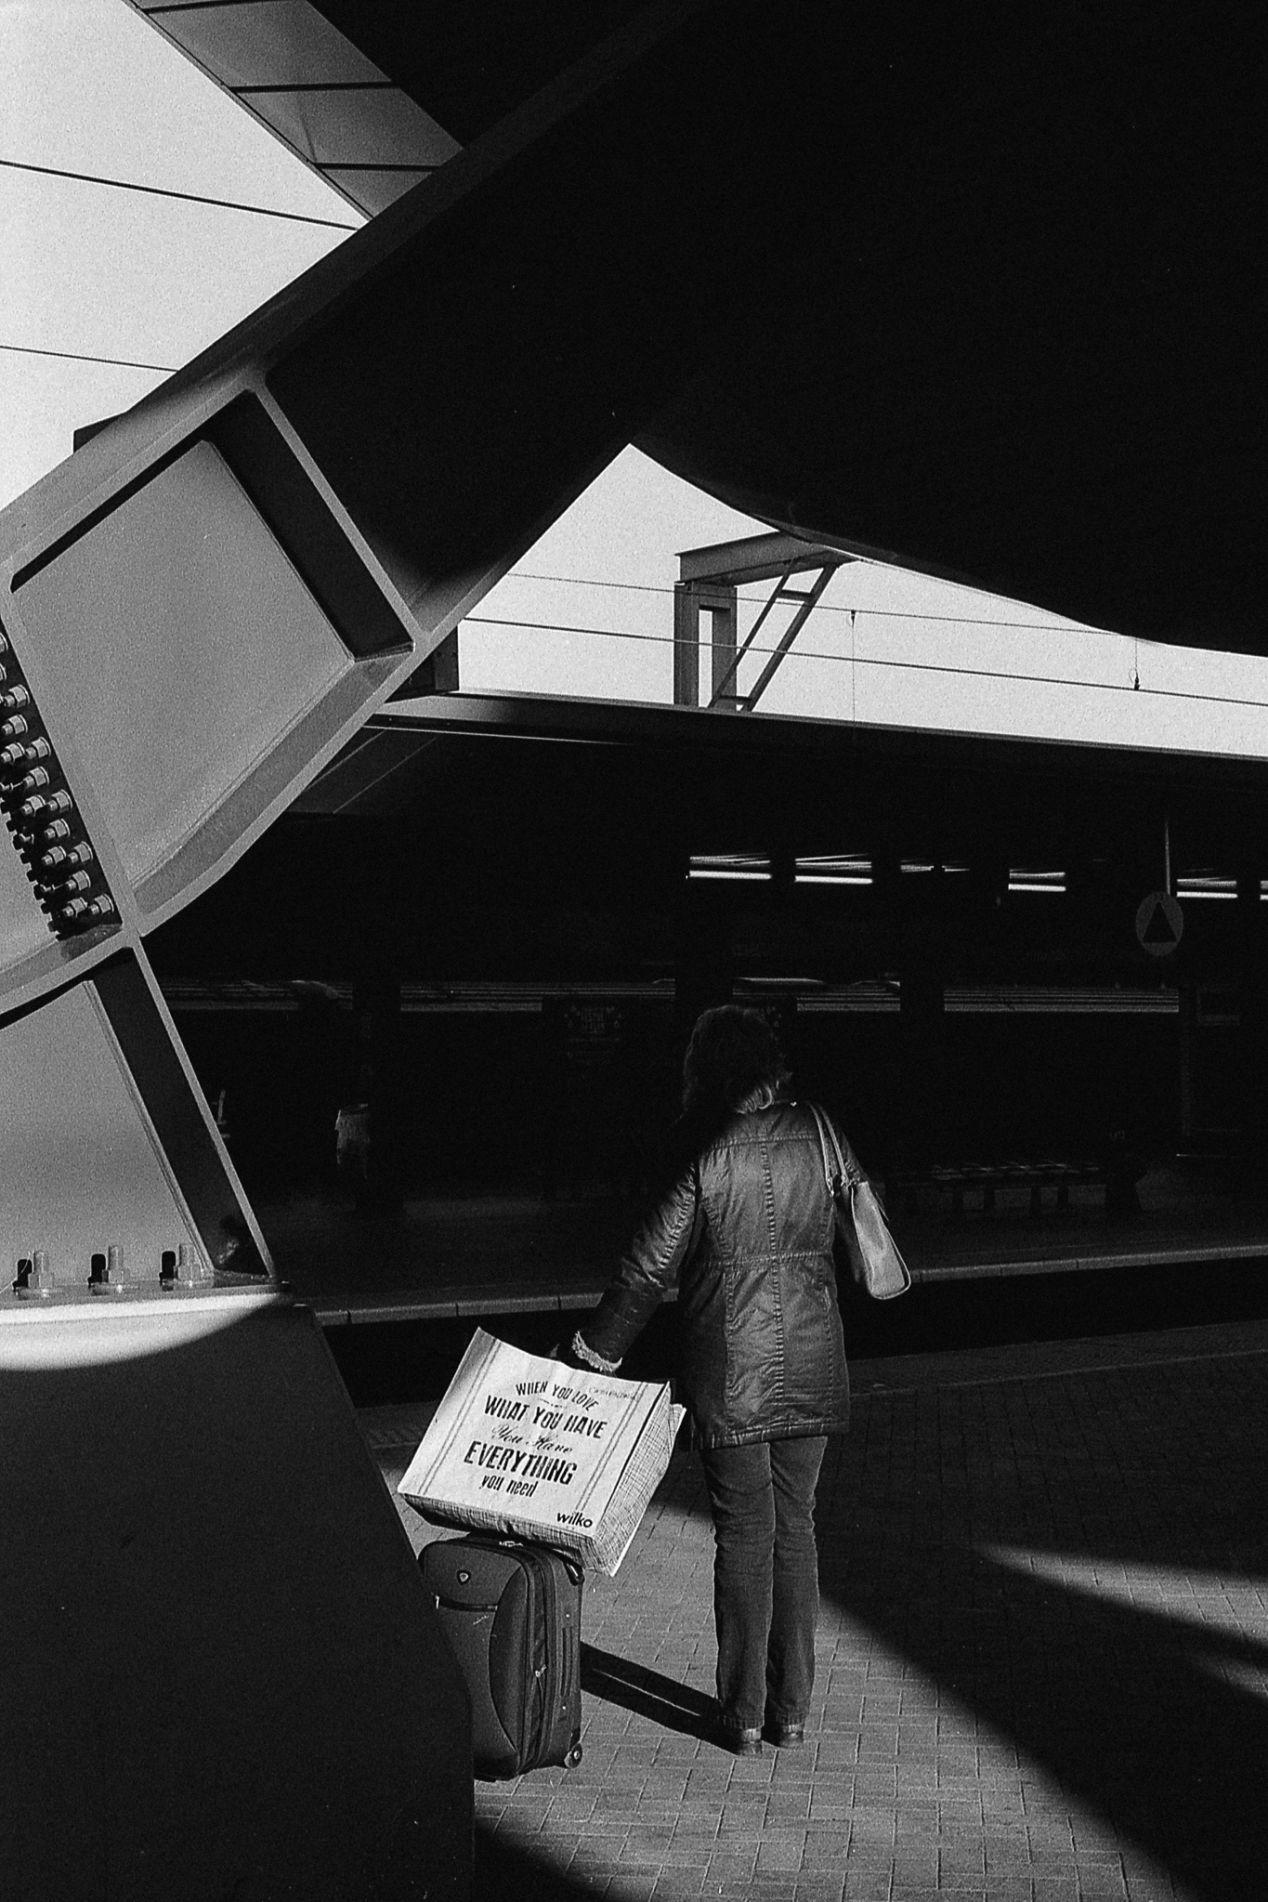 Passenger. Reading Station, UK. Ilford HP5, pushed to 1600.